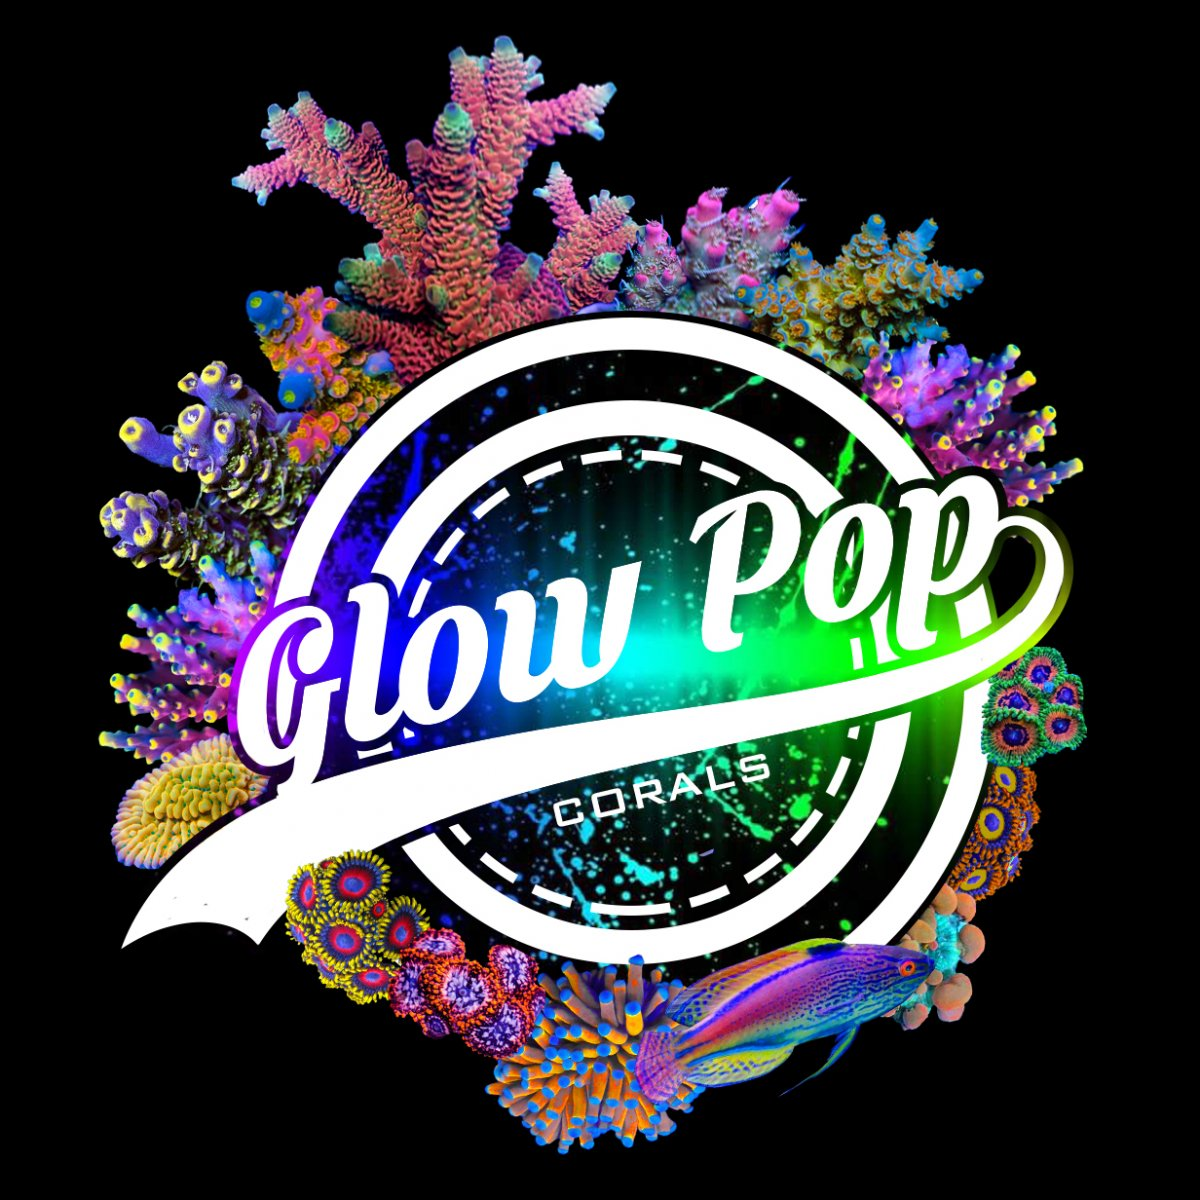 glow pop corals logo 2.jpg